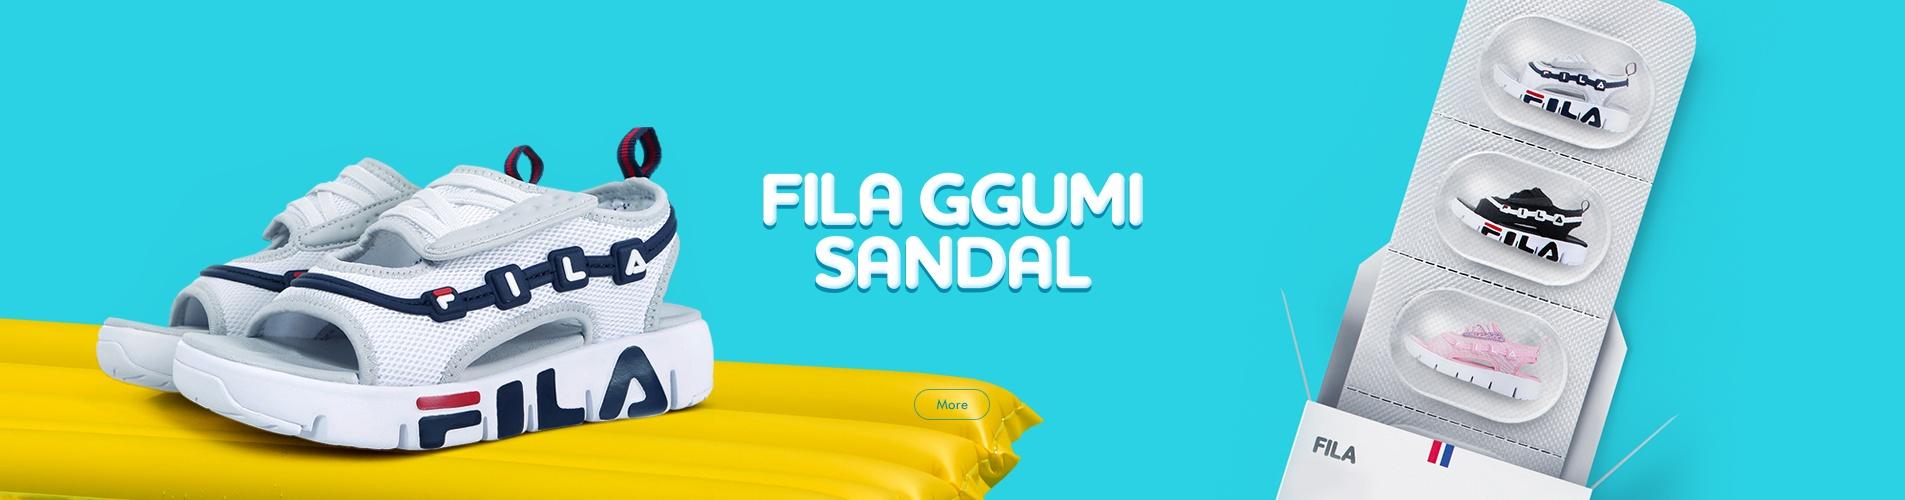 FILA KIDS GGUMI SANDAL